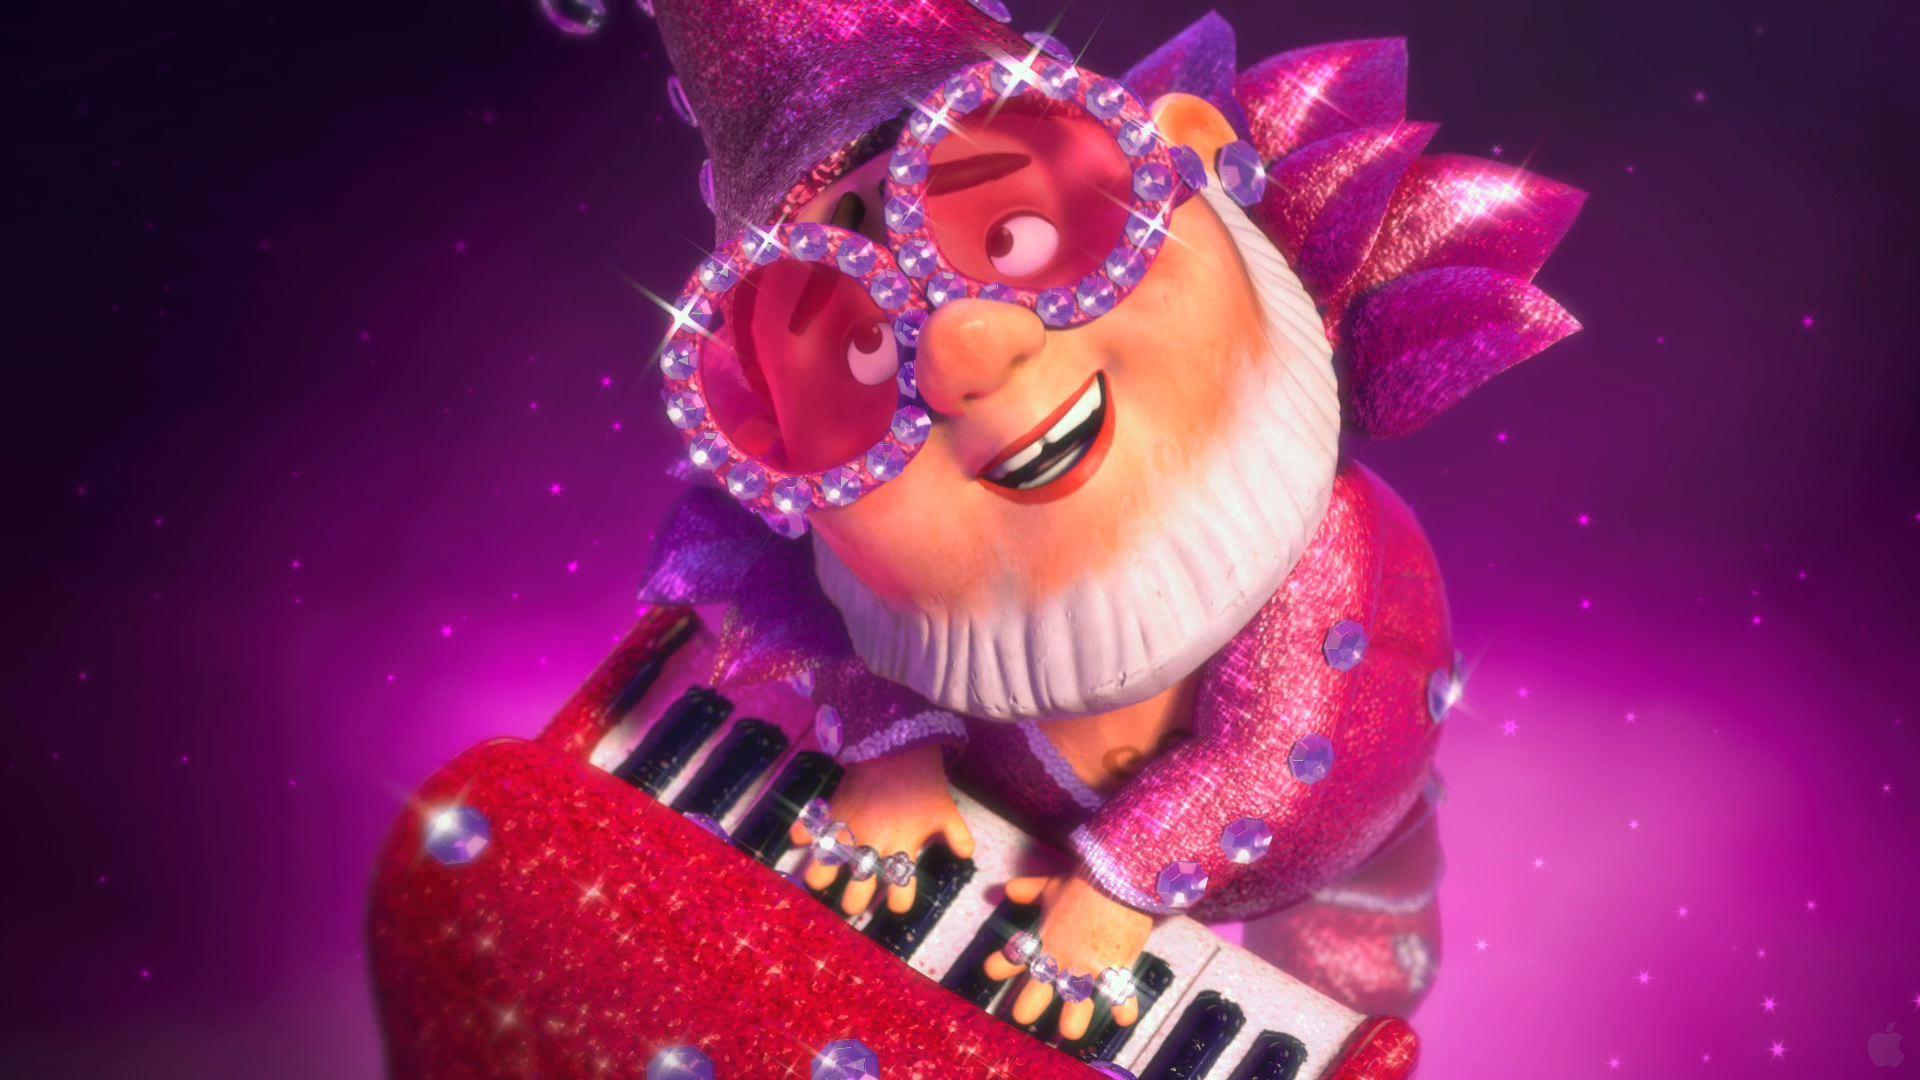 Elton John Lawn Gnome From Gnomeo And Juliet Desktop Wallpaper